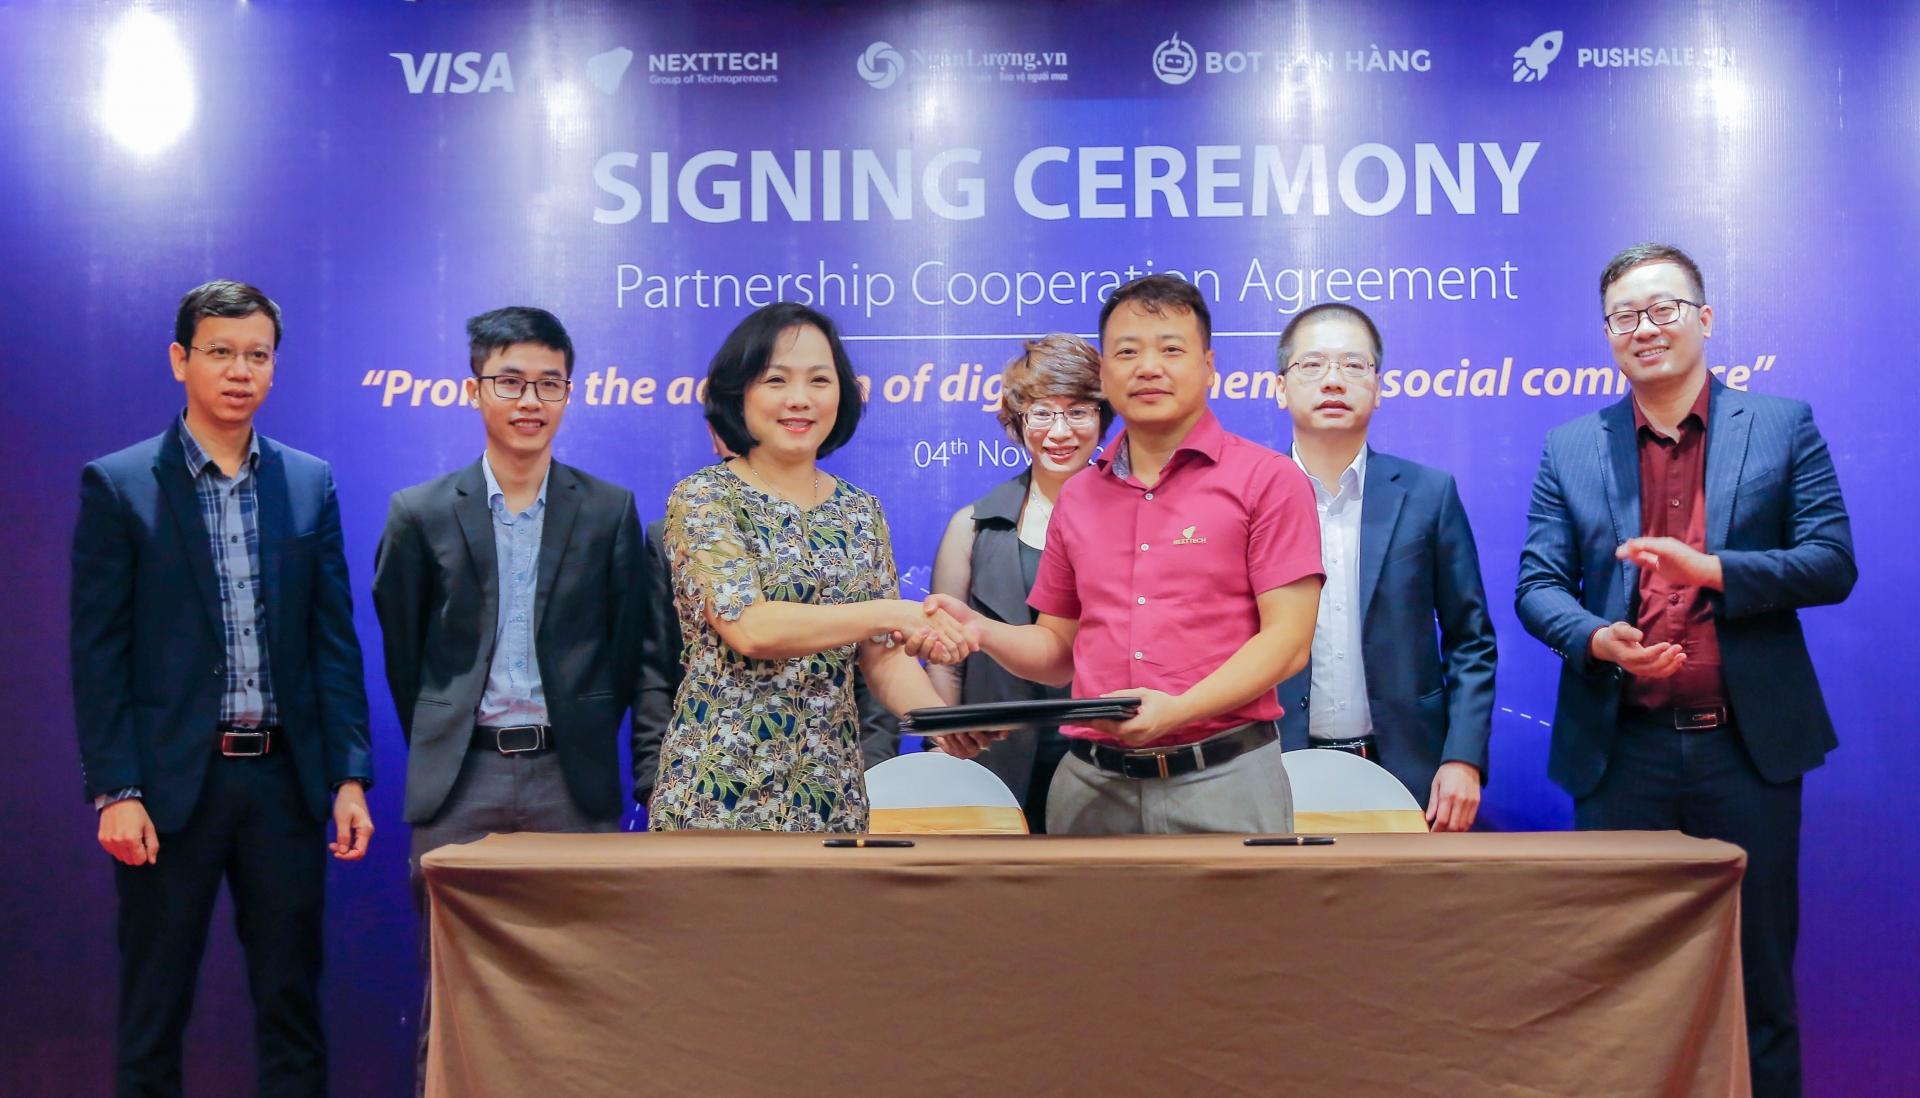 Visa and NextTech sign partnership to support social commerce merchants in Vietnam